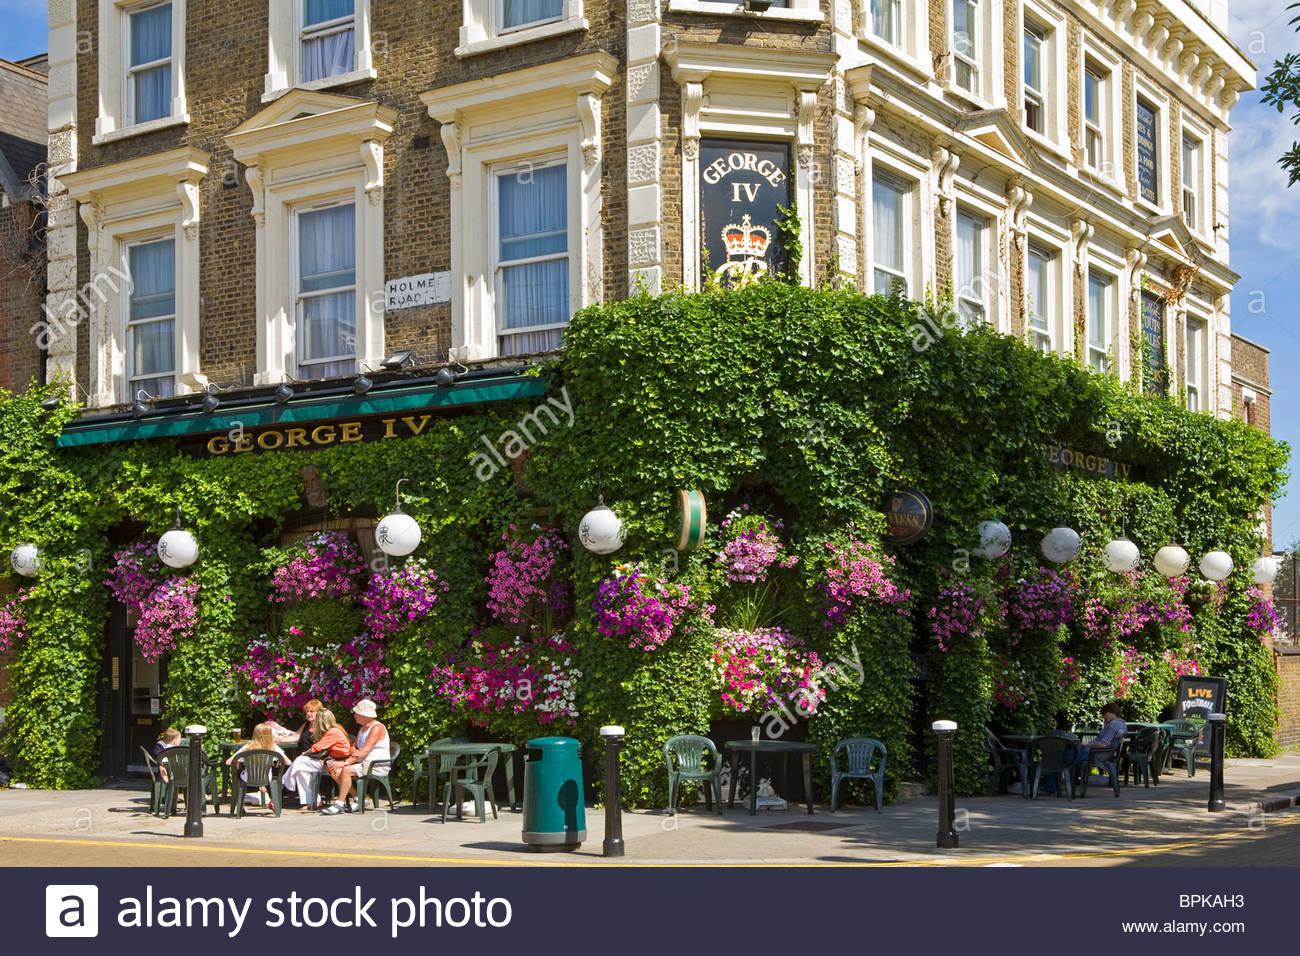 George IV Pub, 89 Holmes Road, Kentish Town, London NW5 3AU 18 JUILLET 2010 Photo Stock